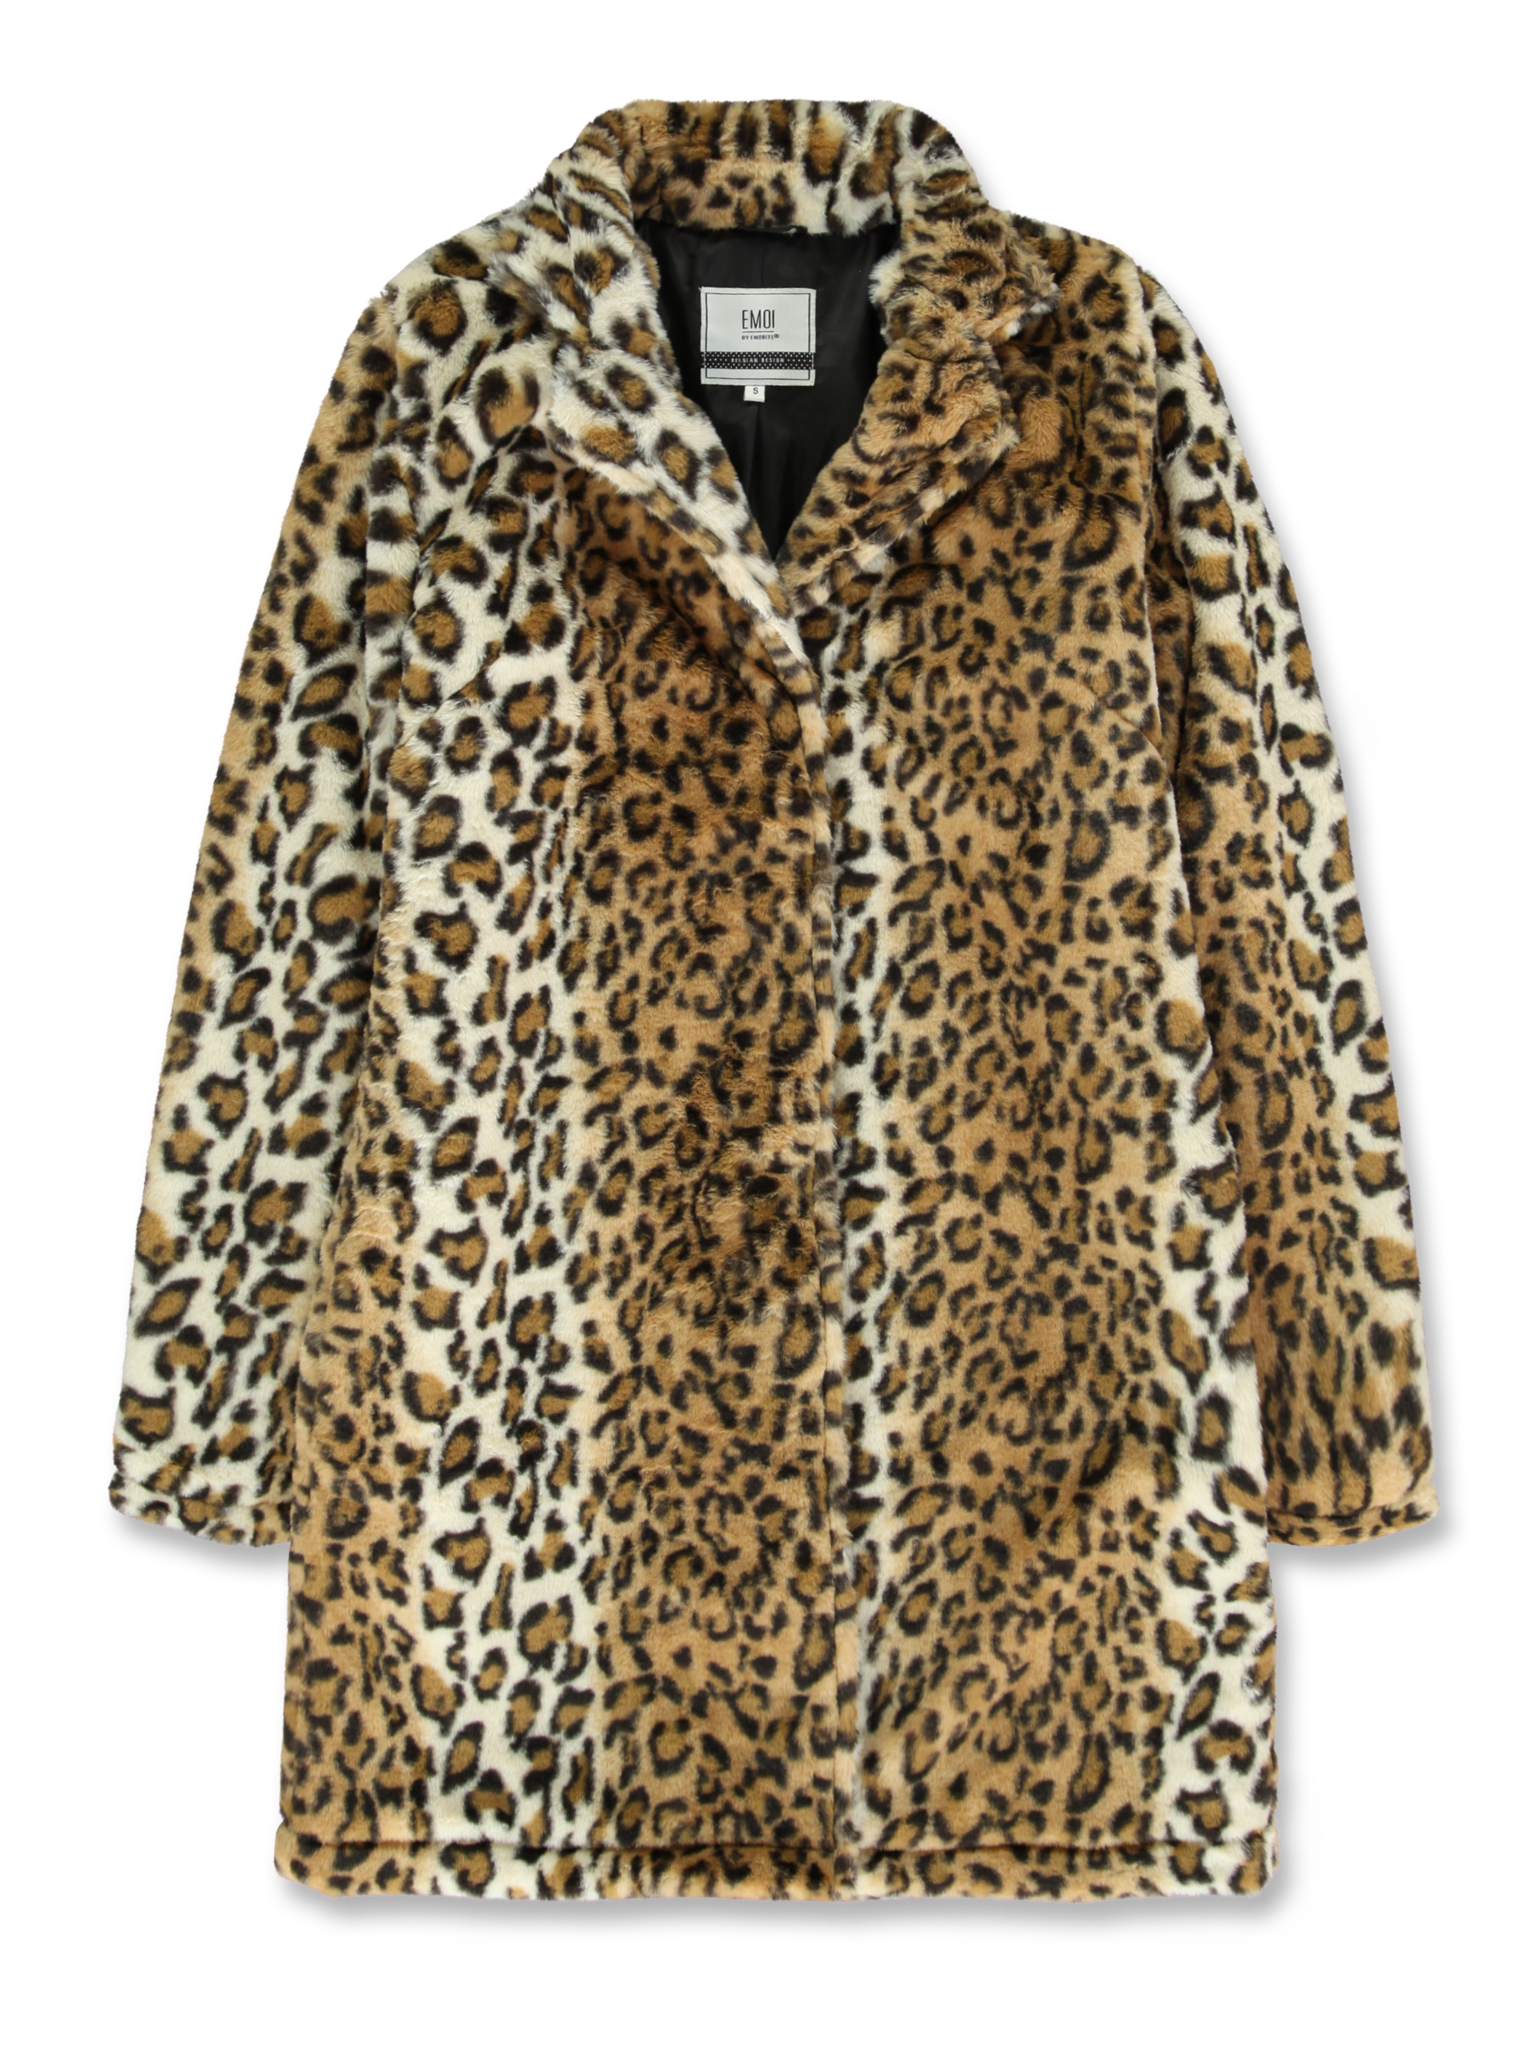 All Brands | Winterproducts Ladies | Jacket | 10 pcs/box